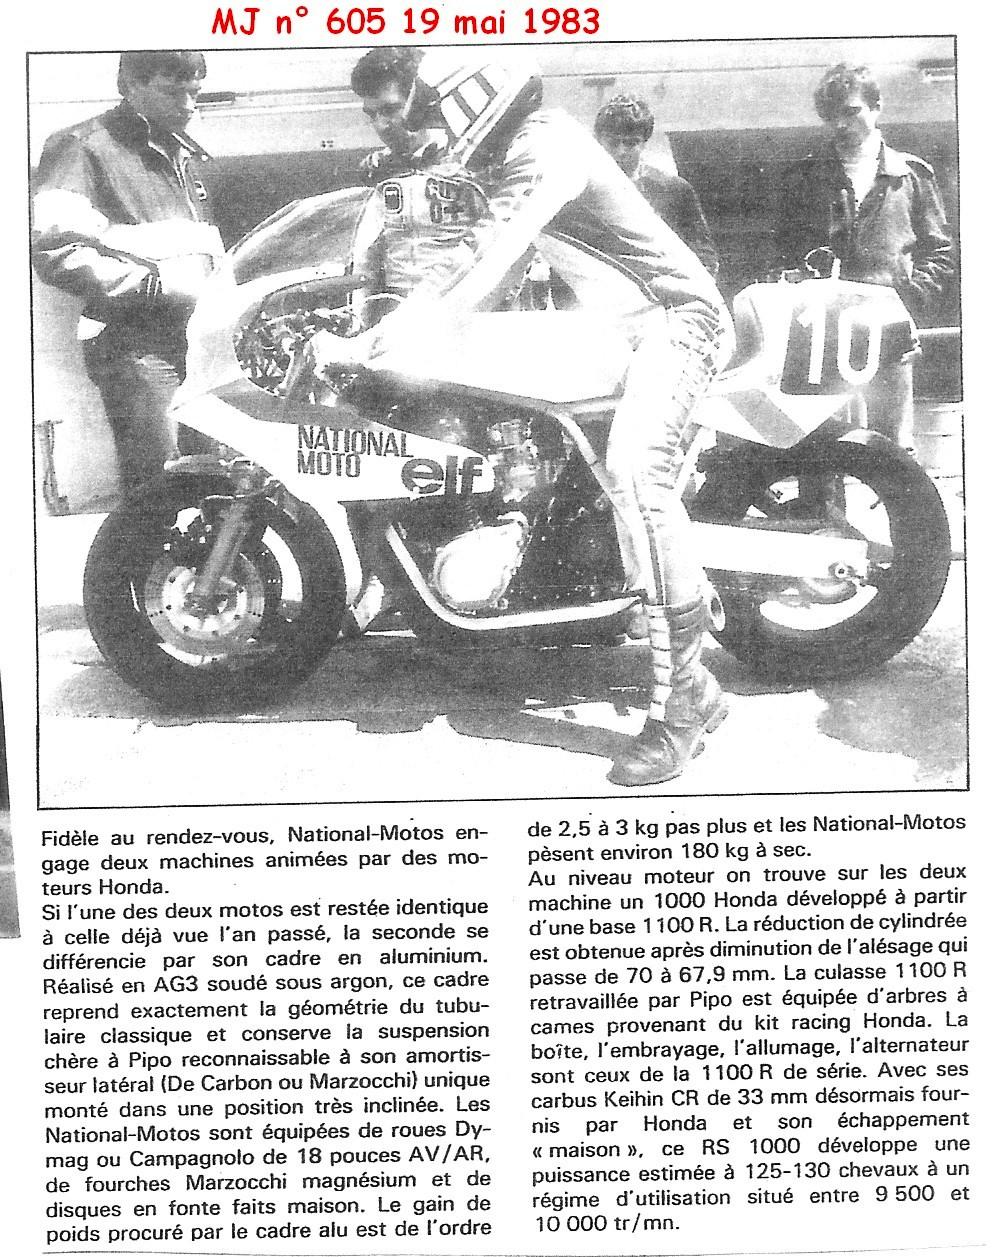 deco  NATIONAL MOTO saison 1983 0210